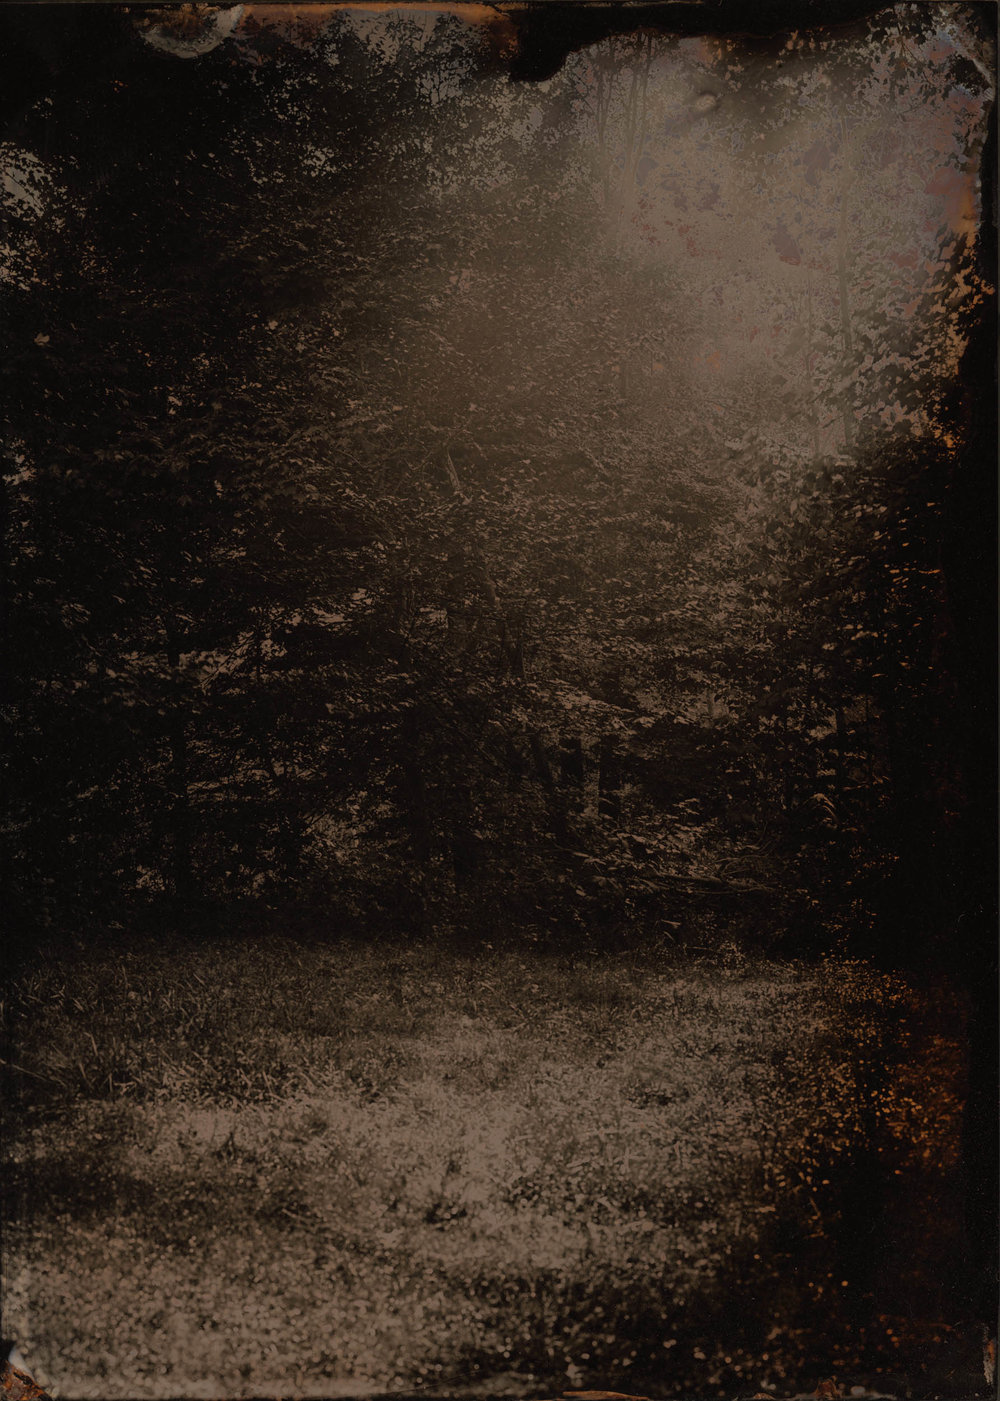 Materia Oscura, ambrotype original, archival pigment print, 40 in.x 50 in., 2019